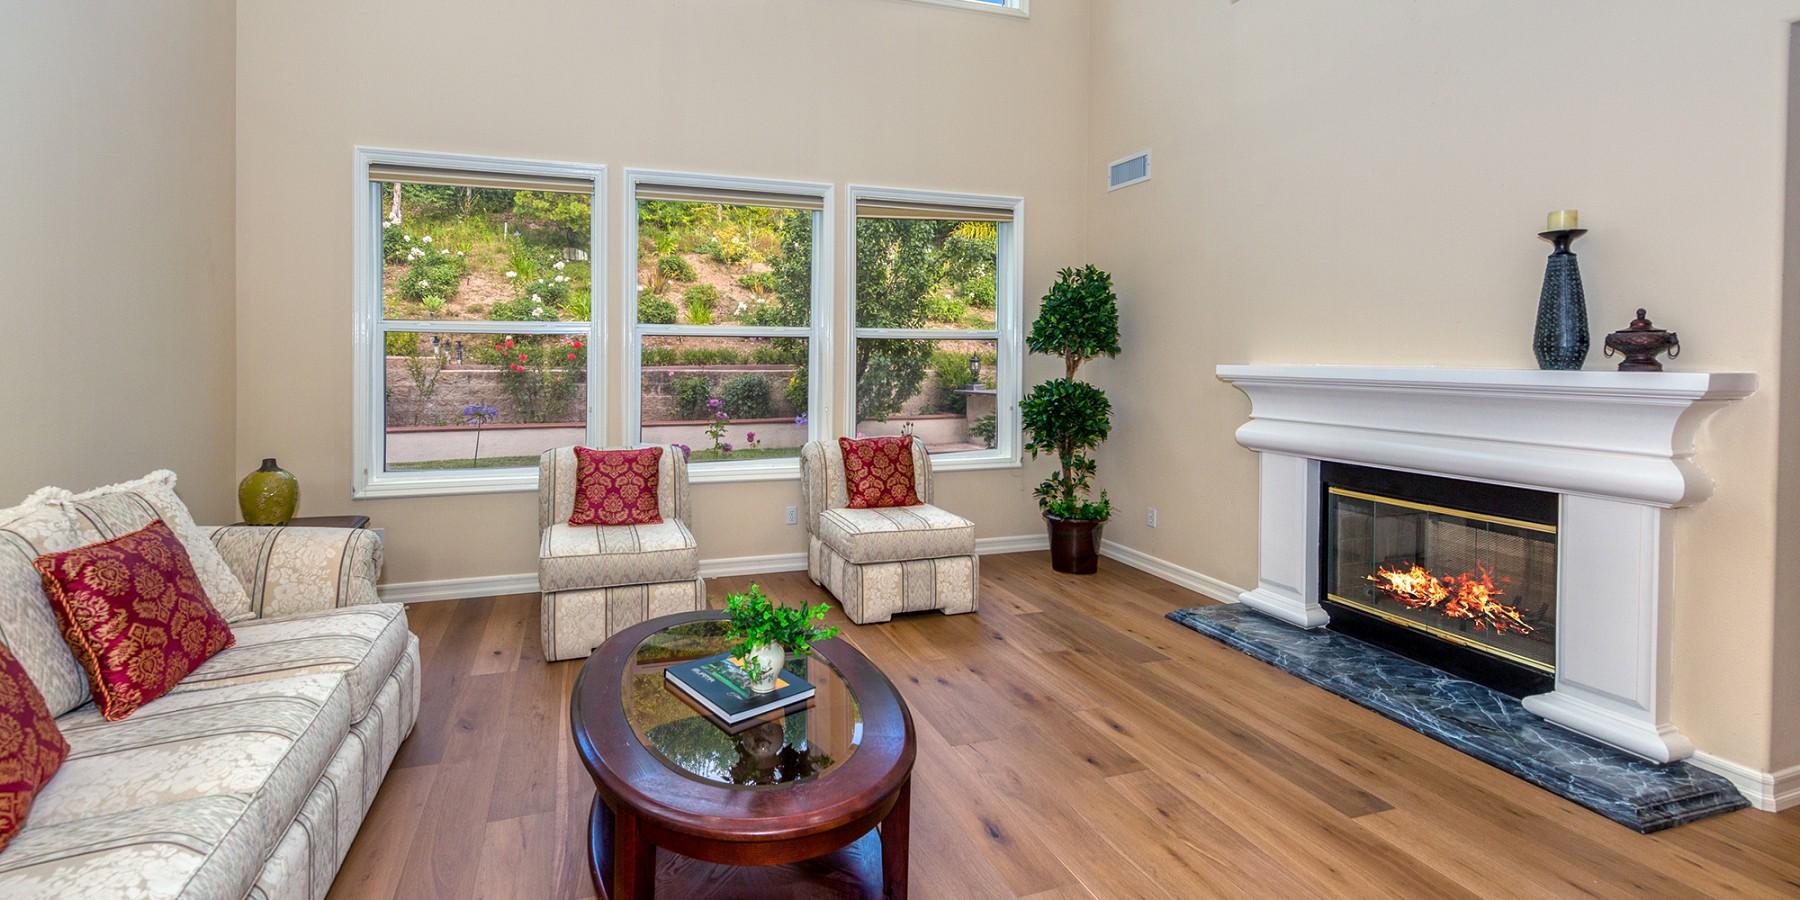 2490 Montecito Ave, Westlake Village, CA 91362